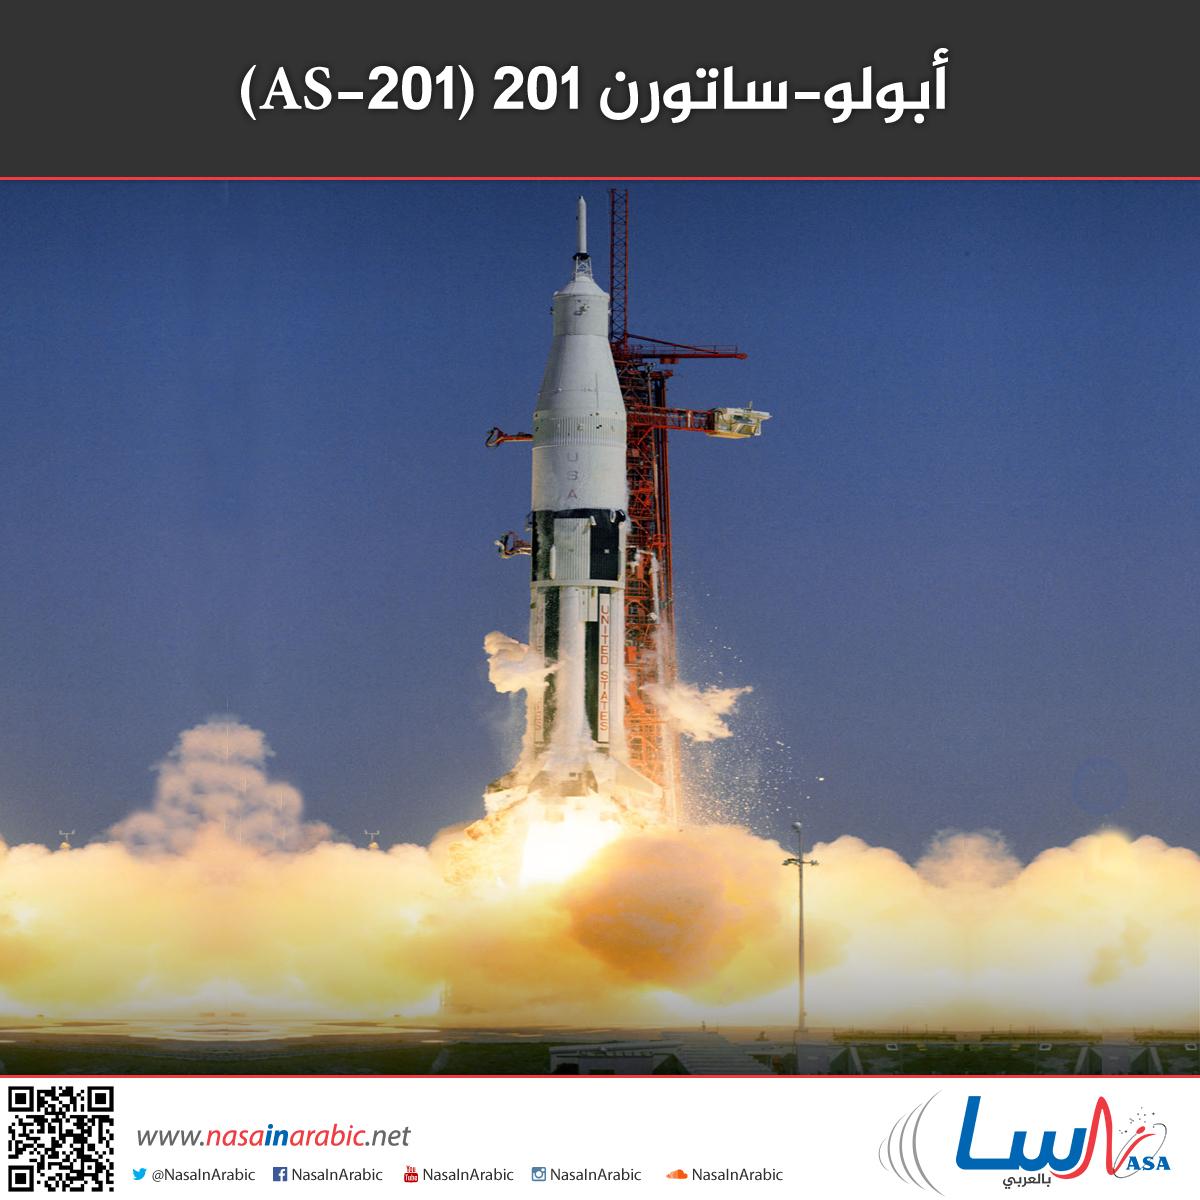 أبولو-ساتورن 201 (AS-201)